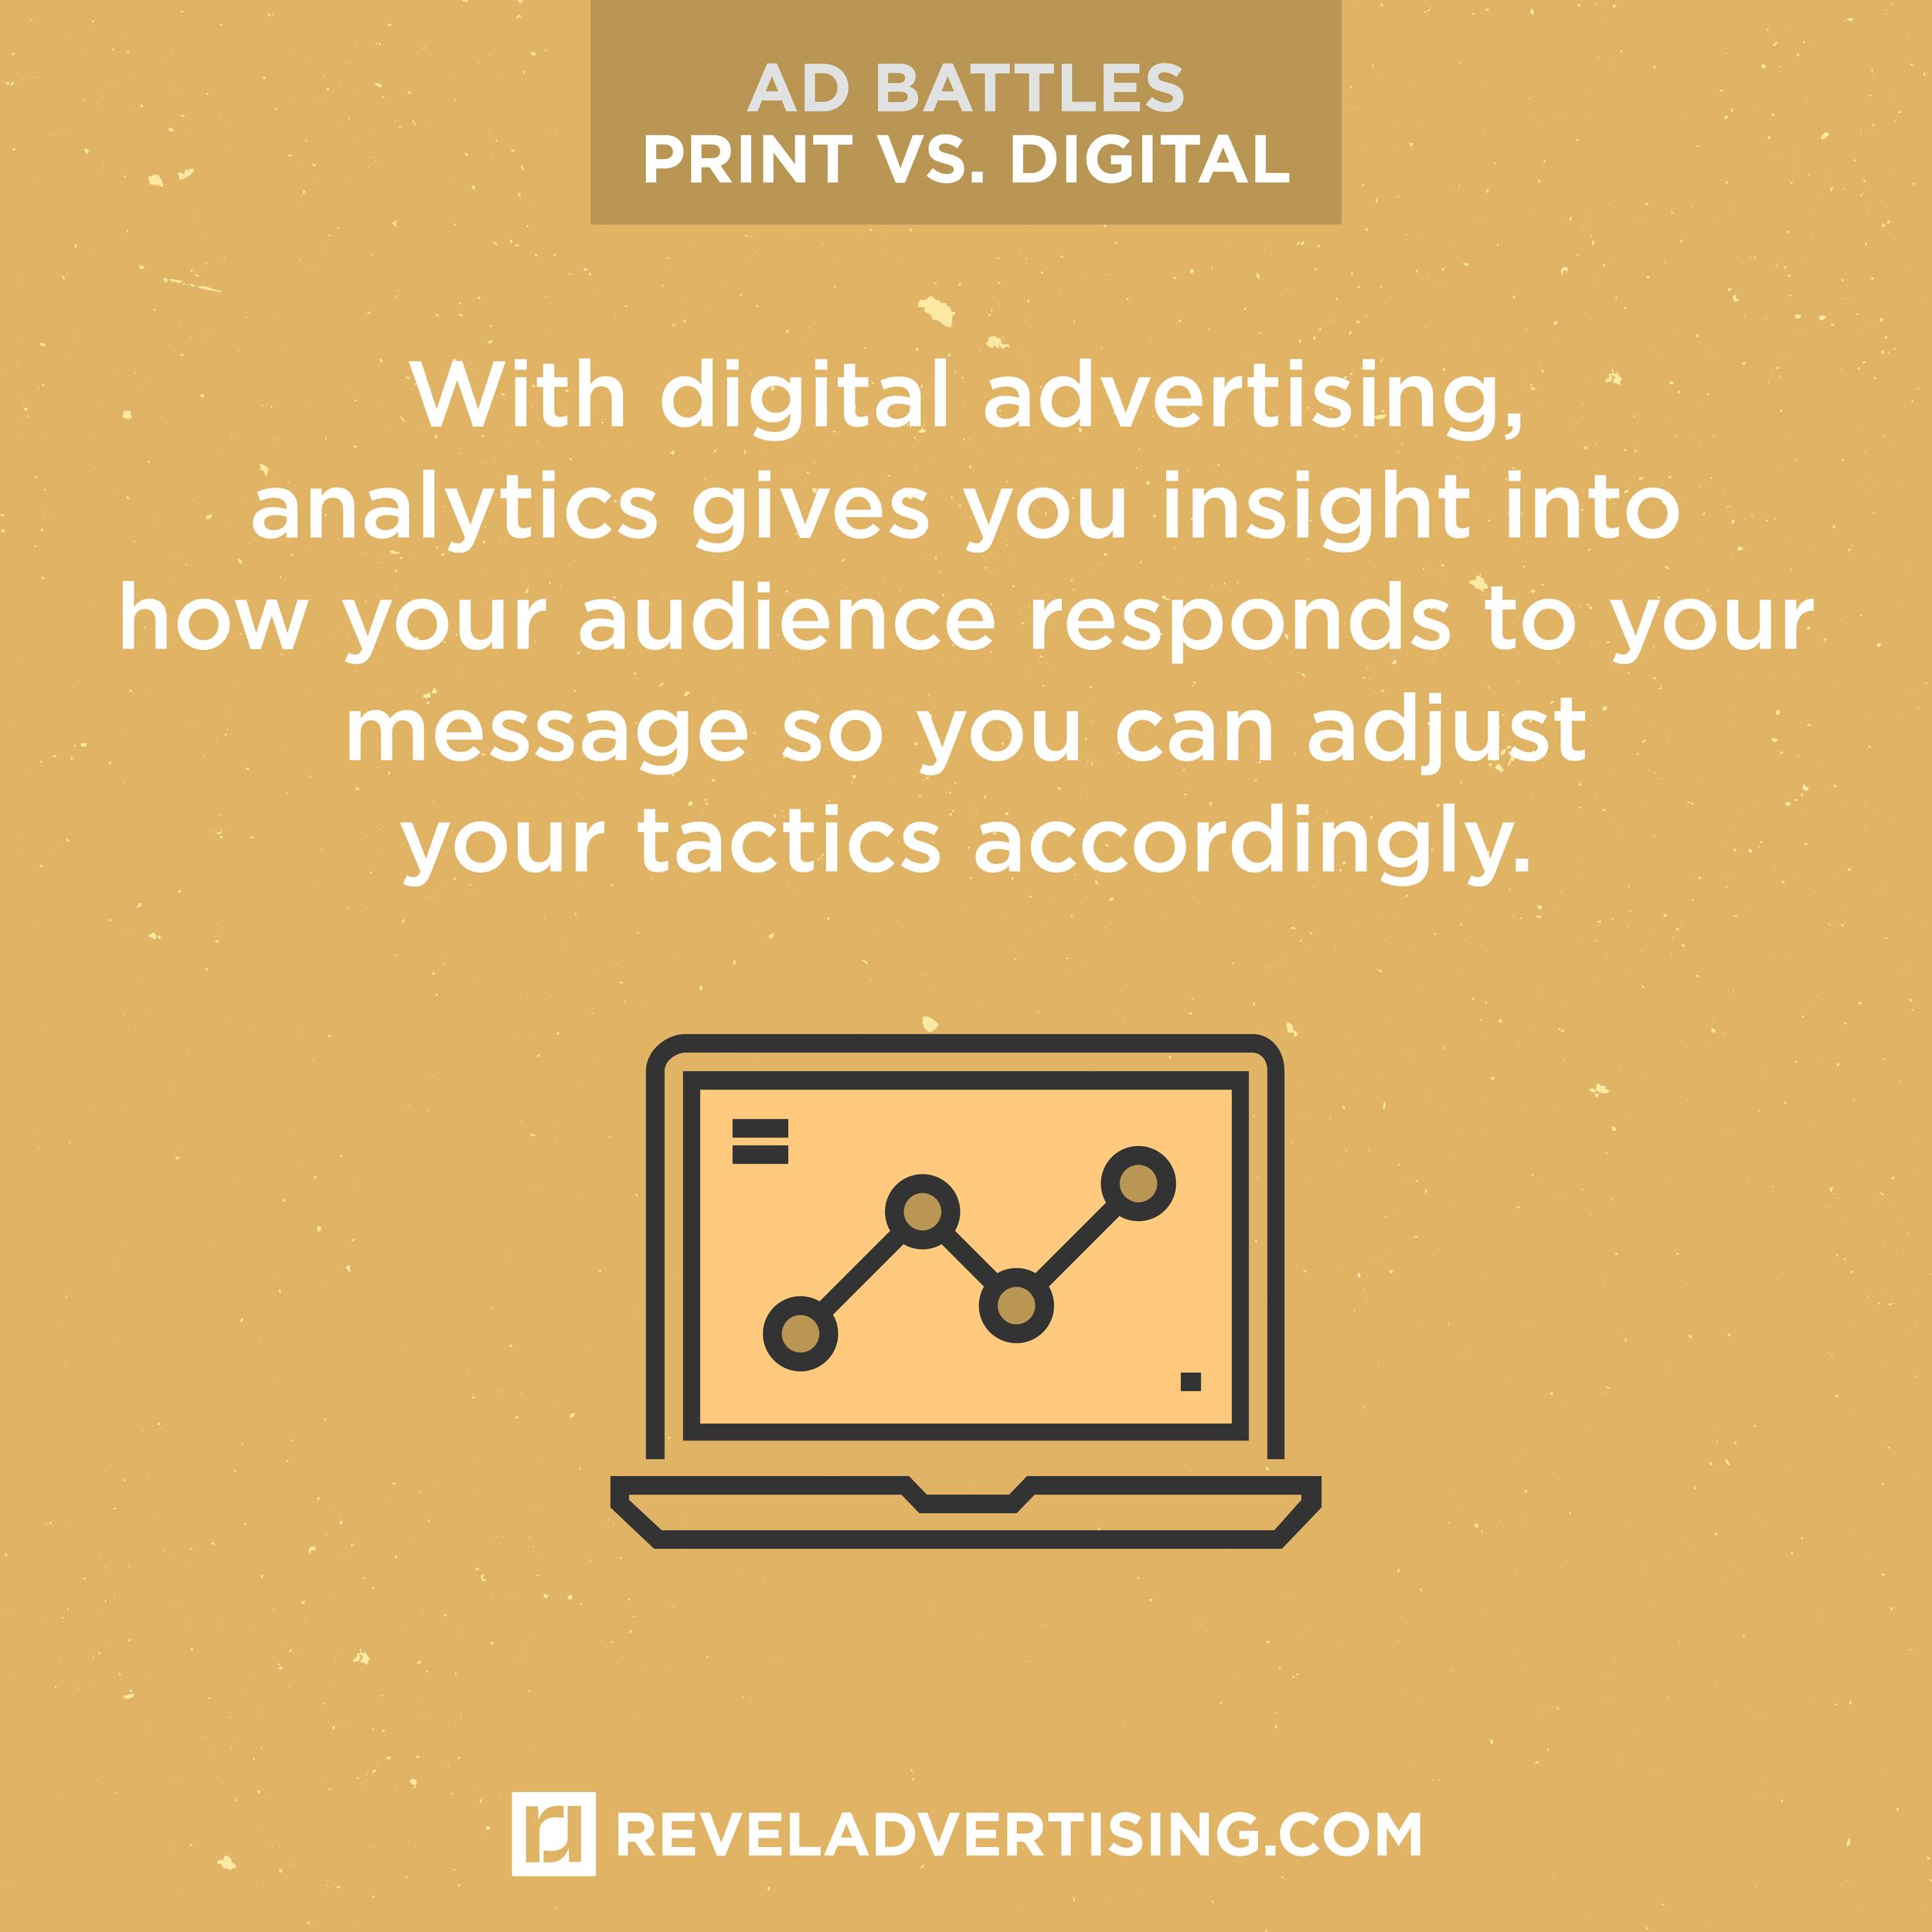 Revel Advertising - Ad Battles - Print vs Digital-02.png